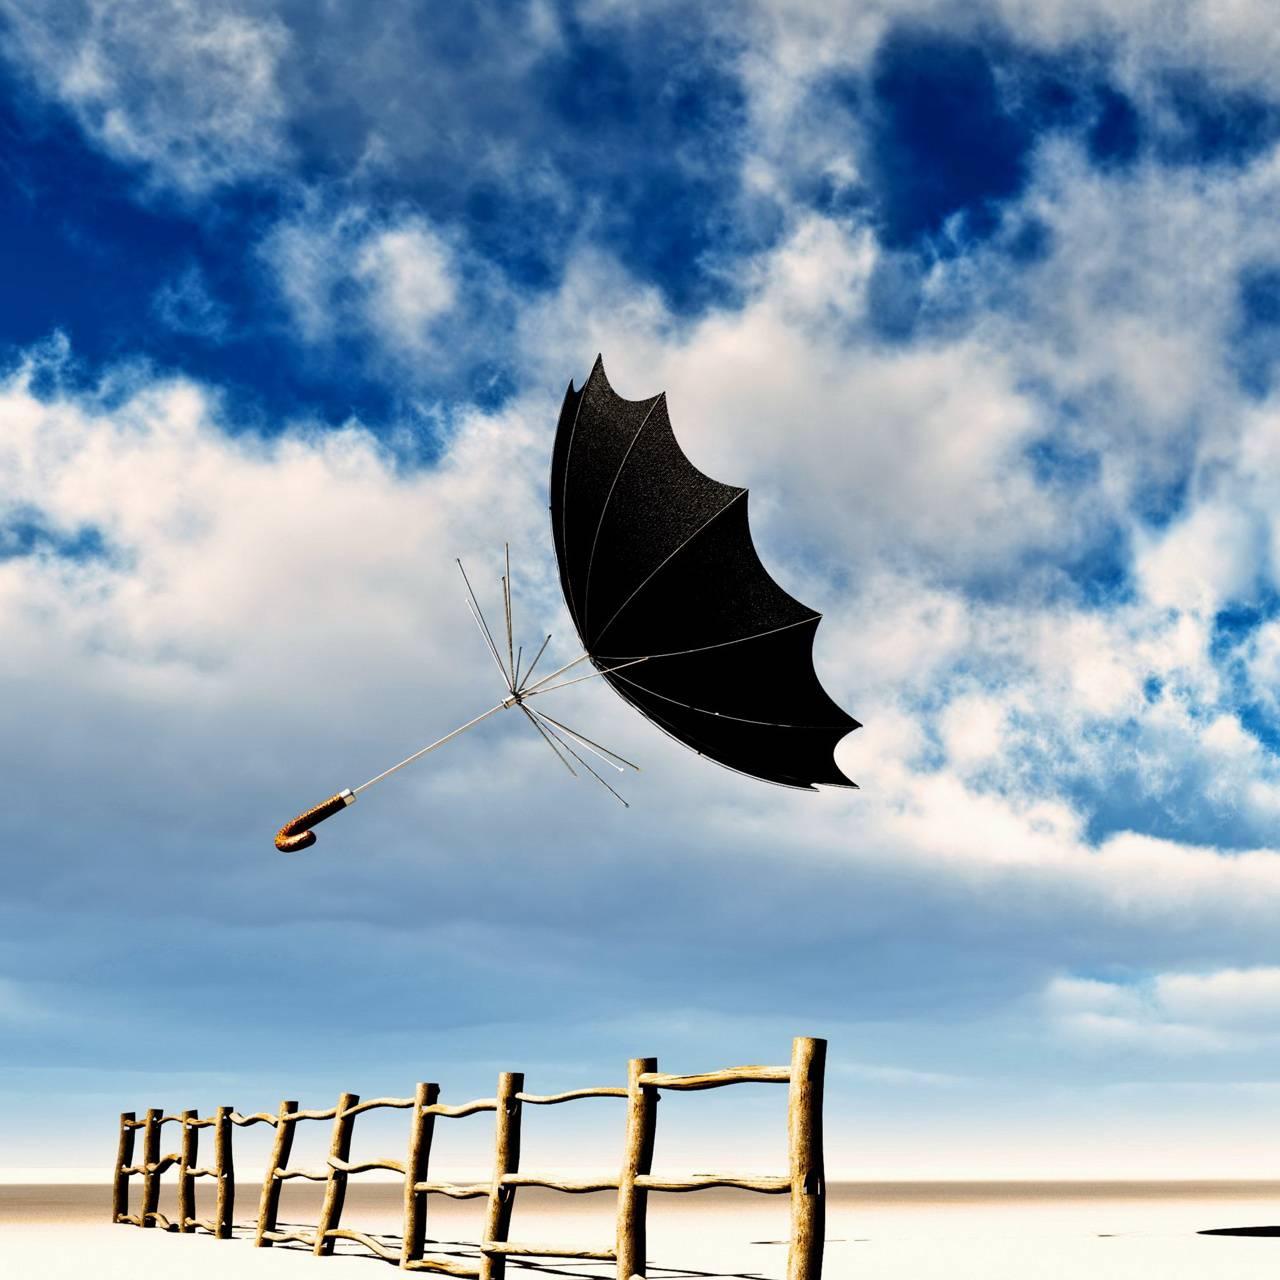 Flying-umbrella